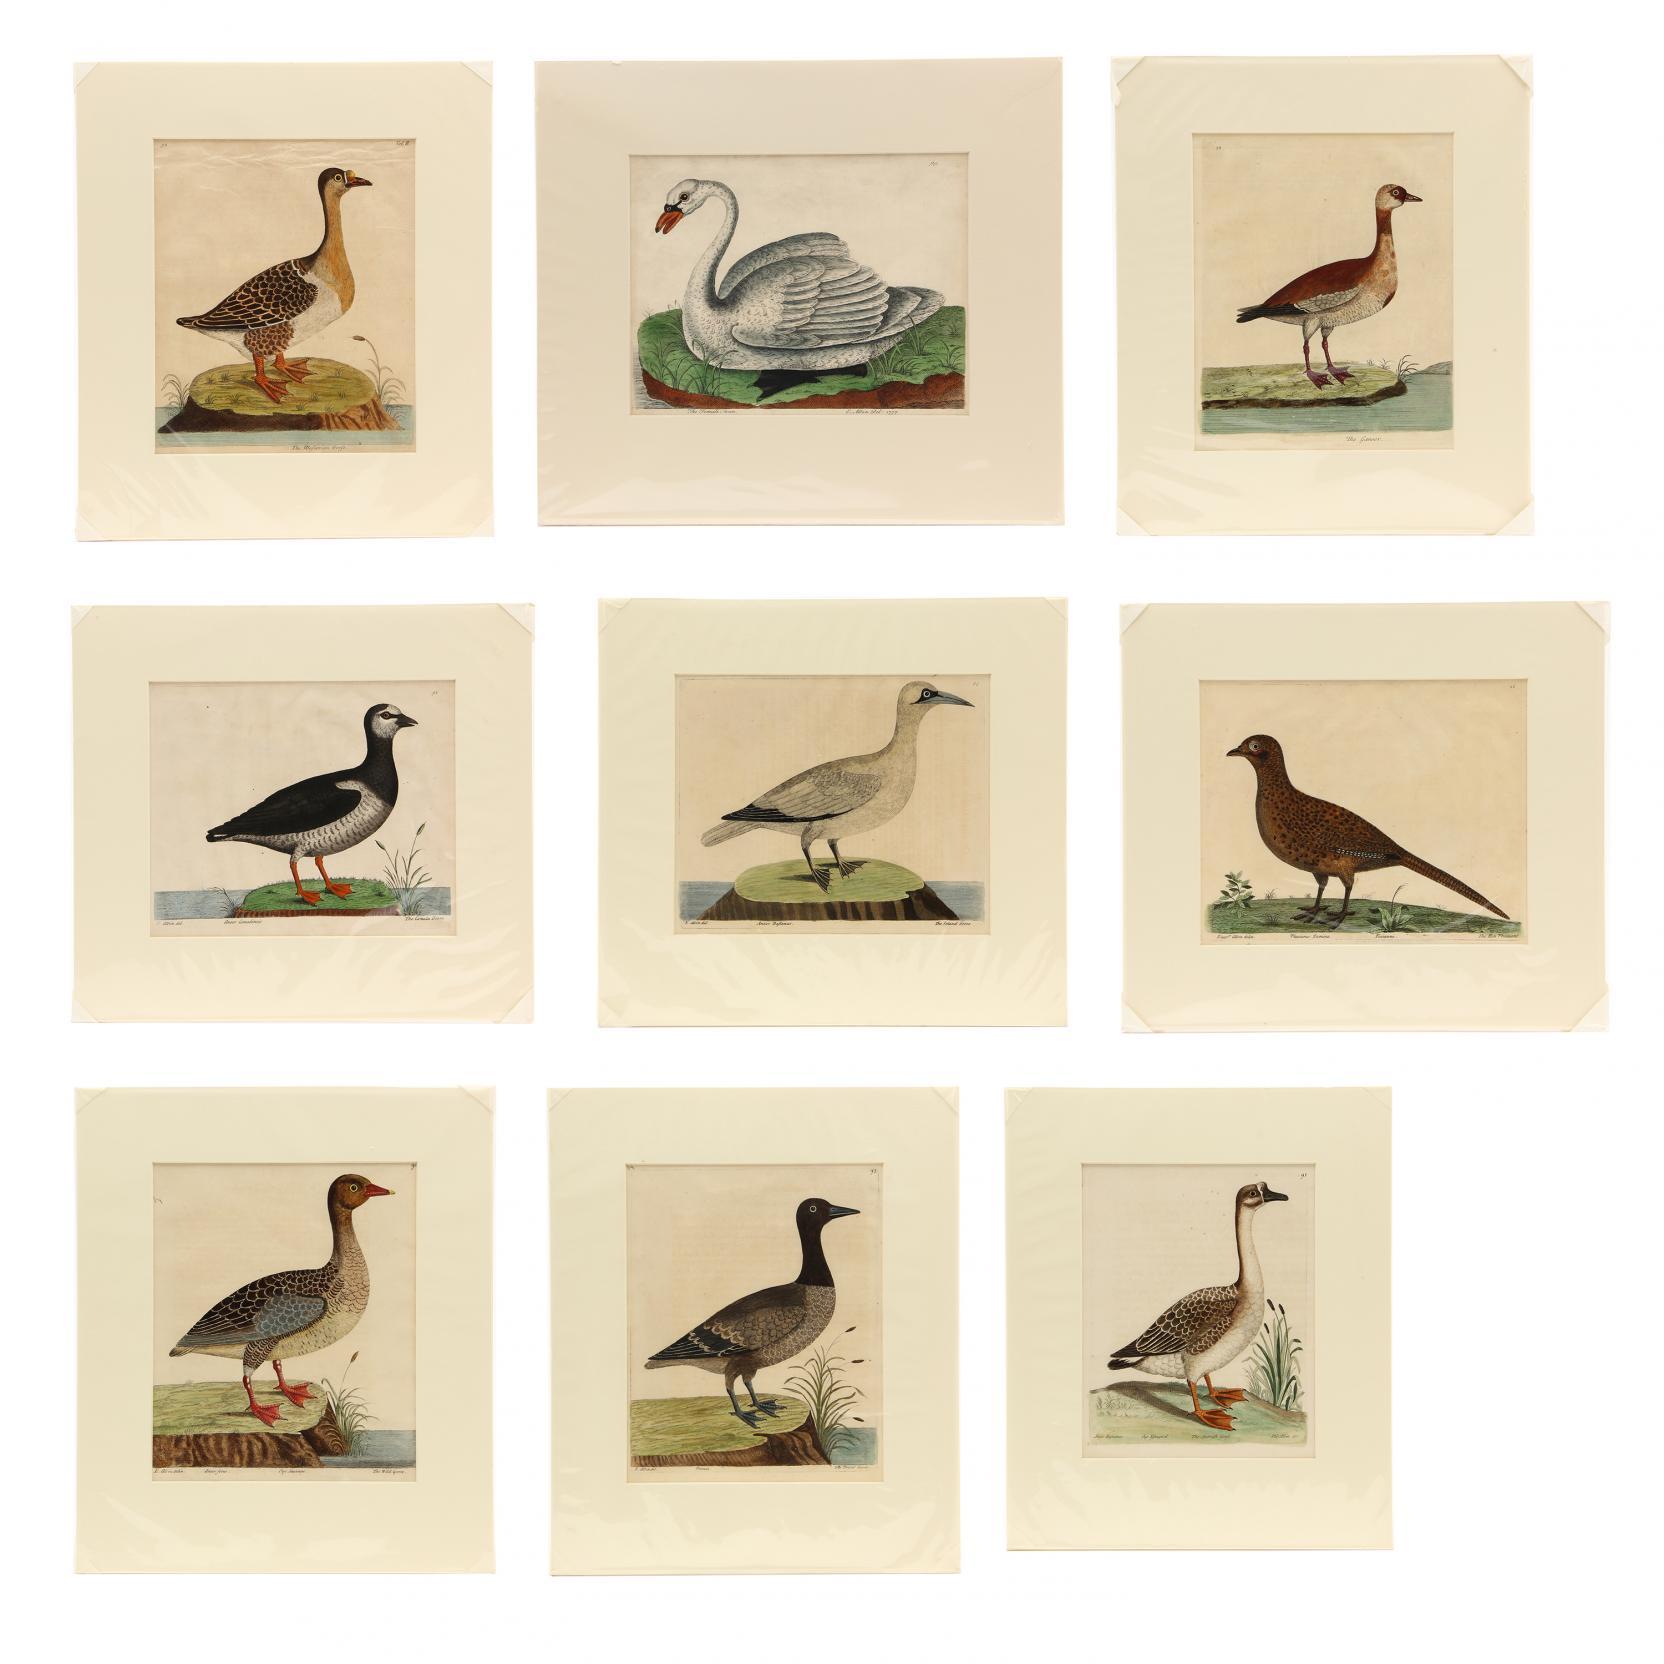 eleazar-albin-british-active-1713-1759-group-of-9-ornithological-prints